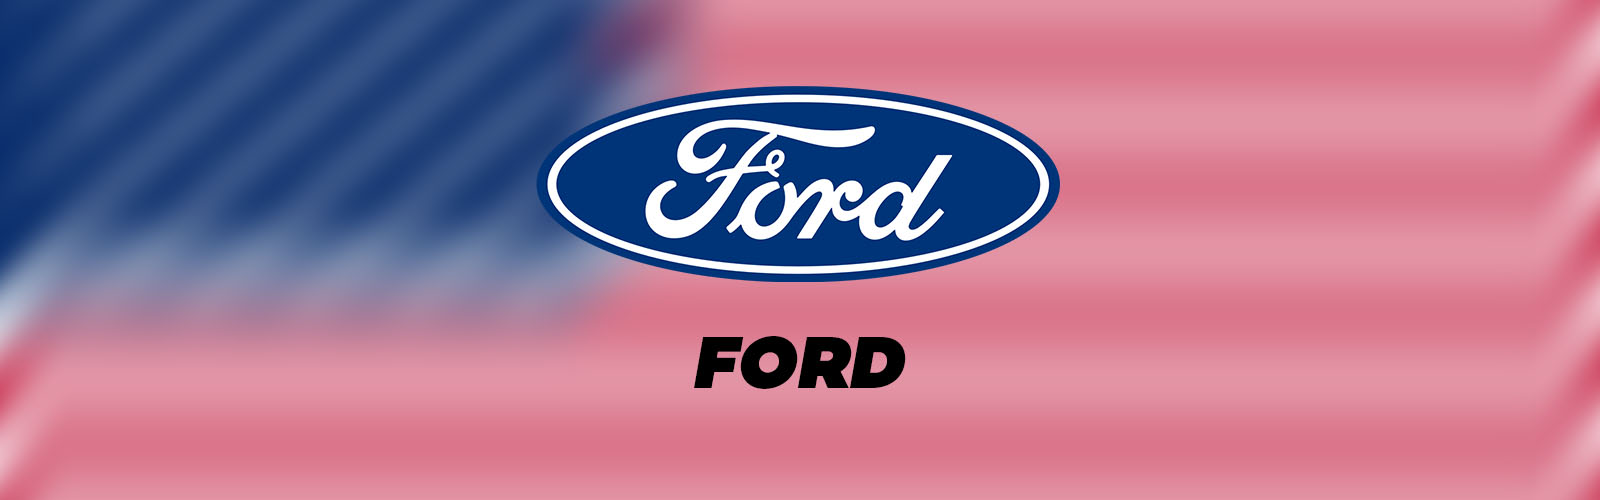 Ford logo marque